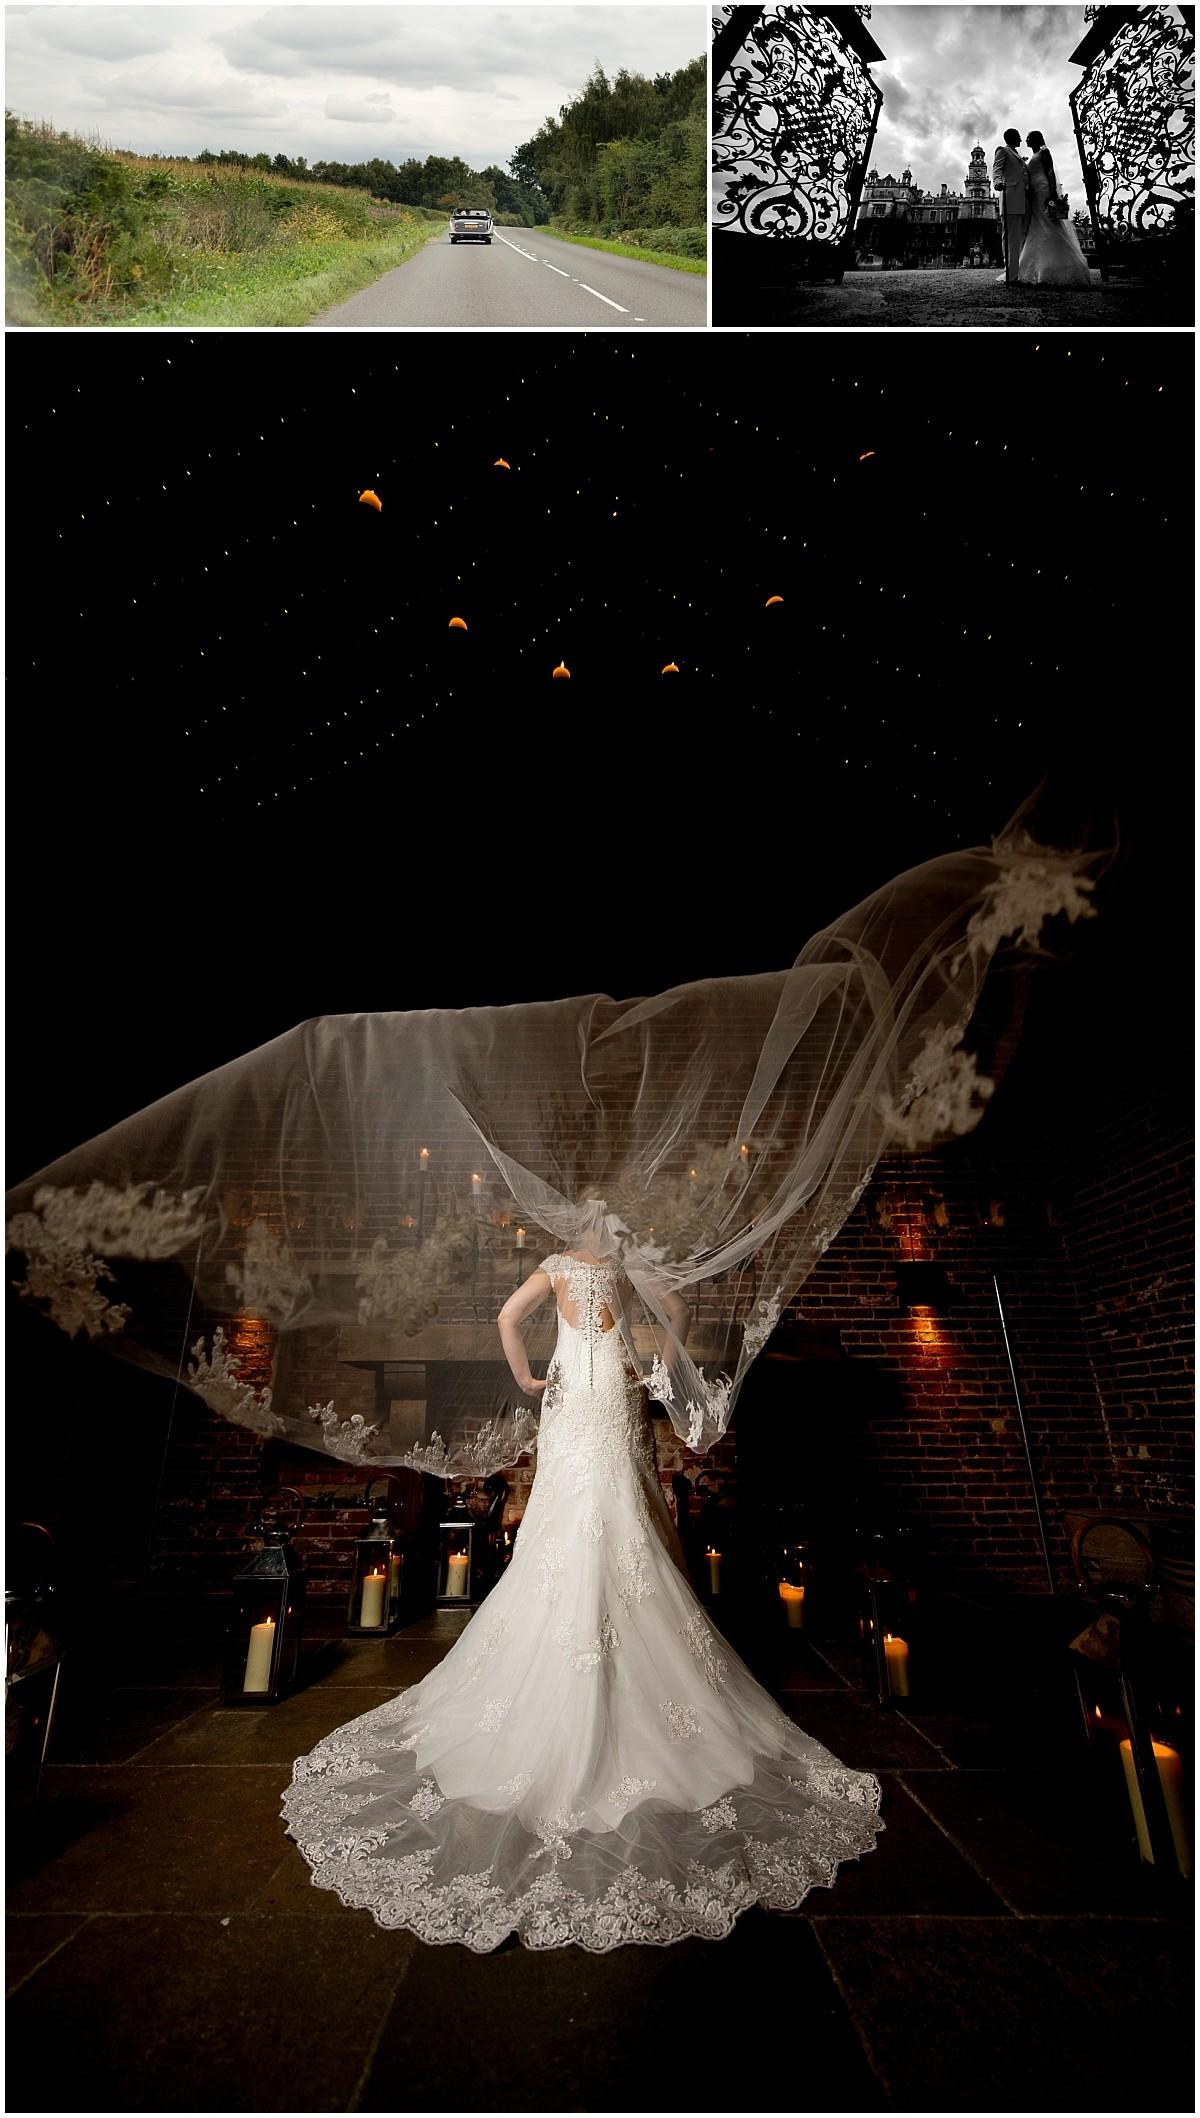 Stunning bride & veil